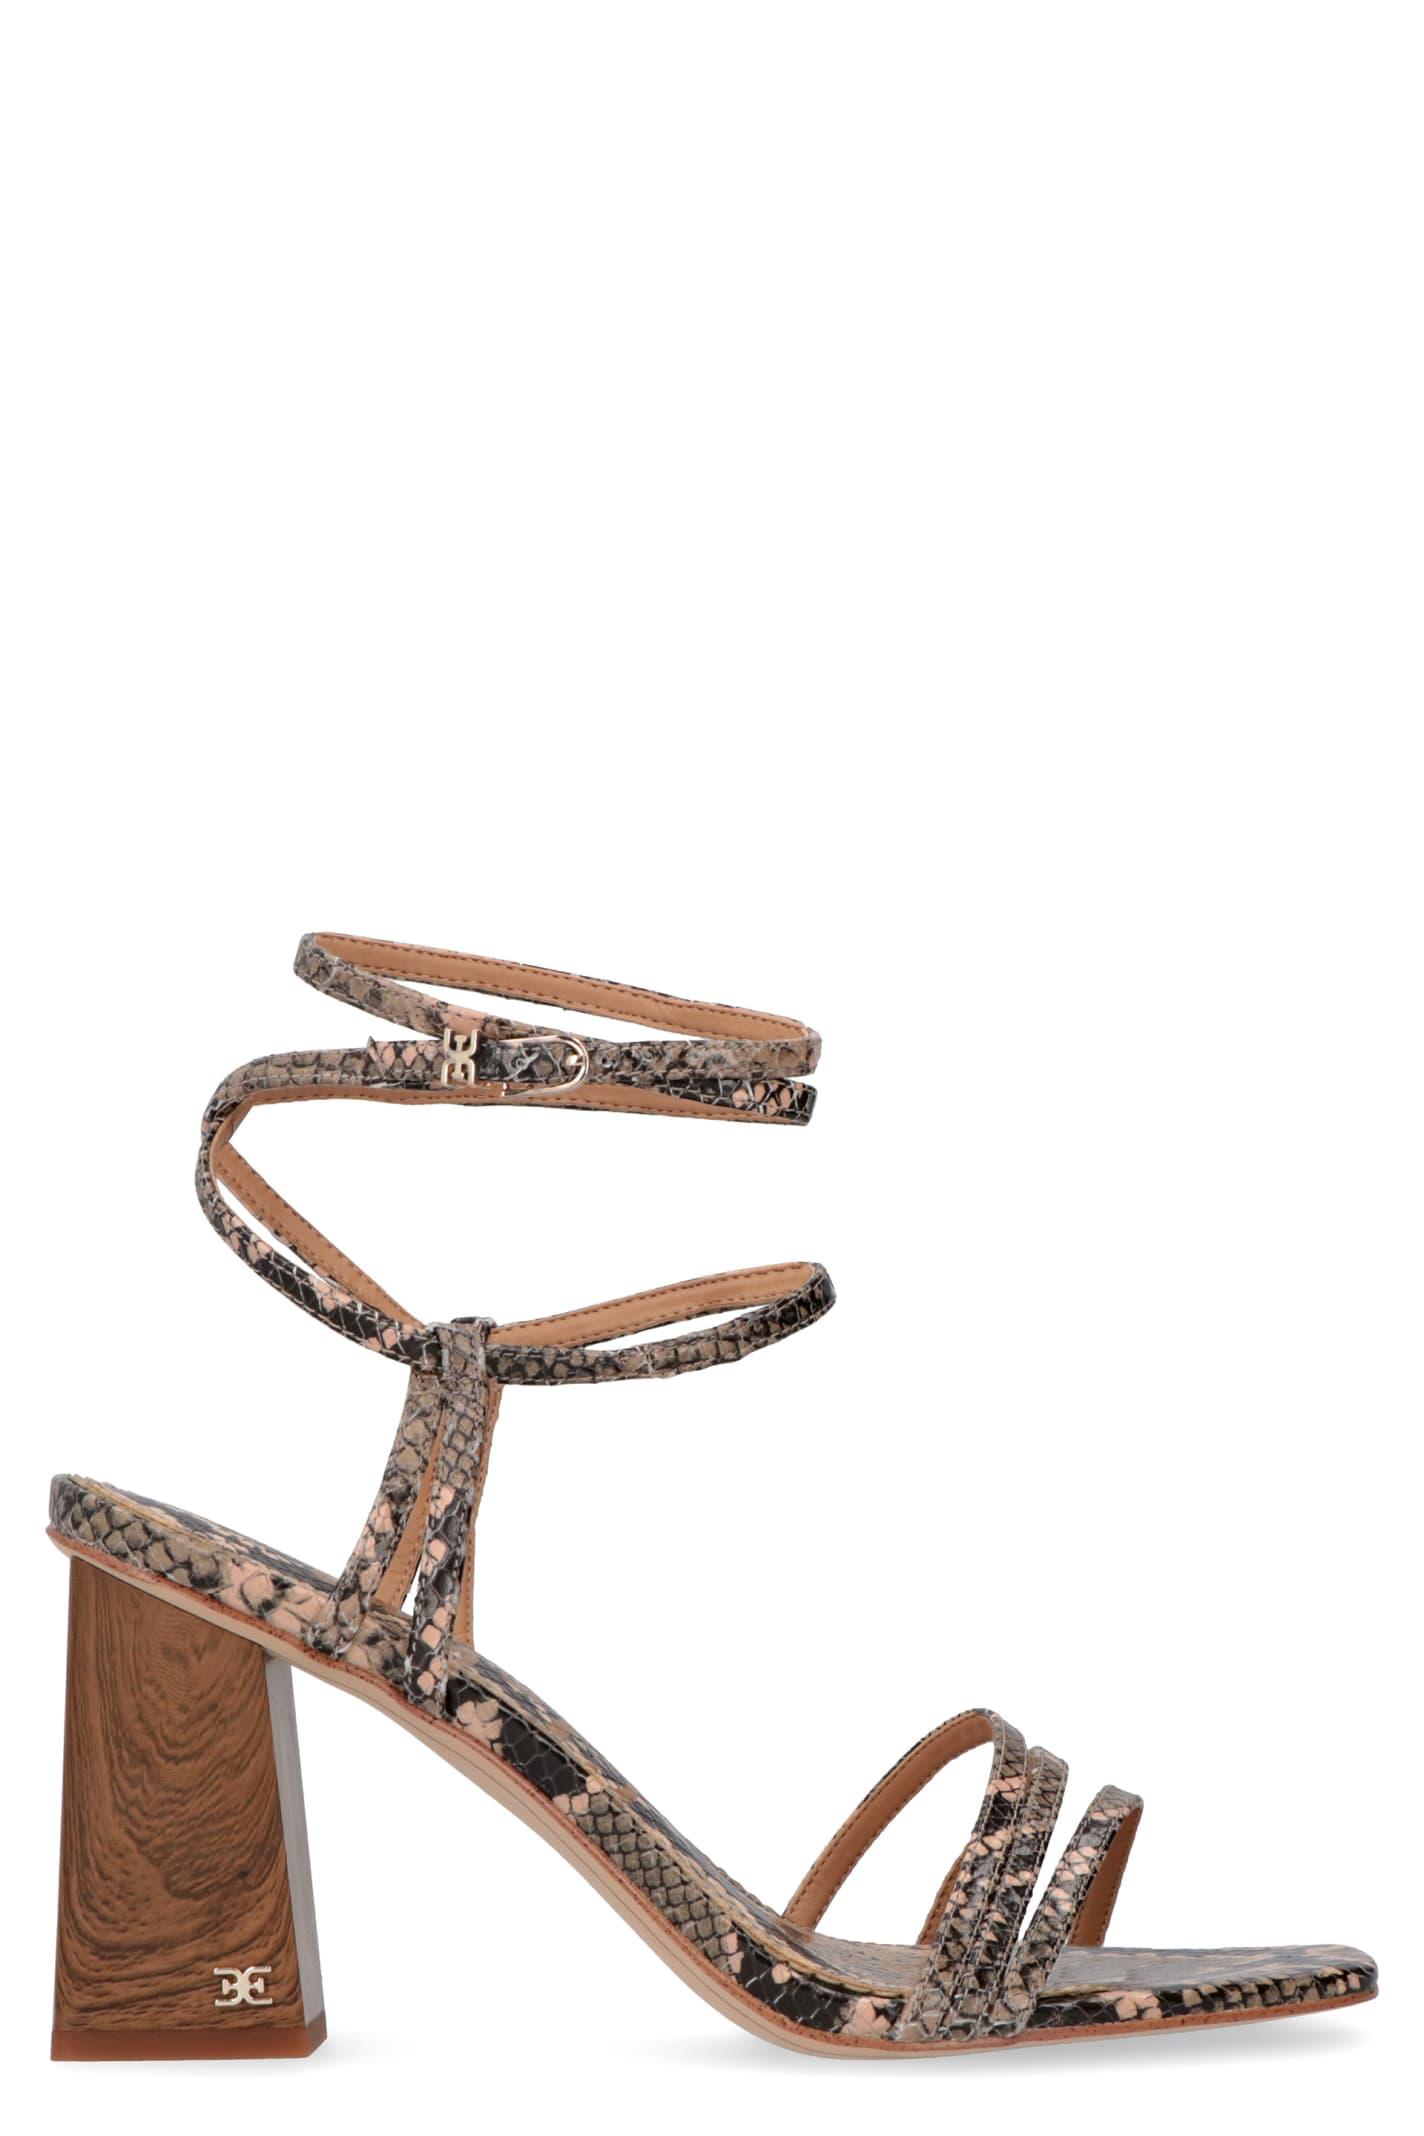 Buy Sam Edelman Doriss Heeled Sandals online, shop Sam Edelman shoes with free shipping